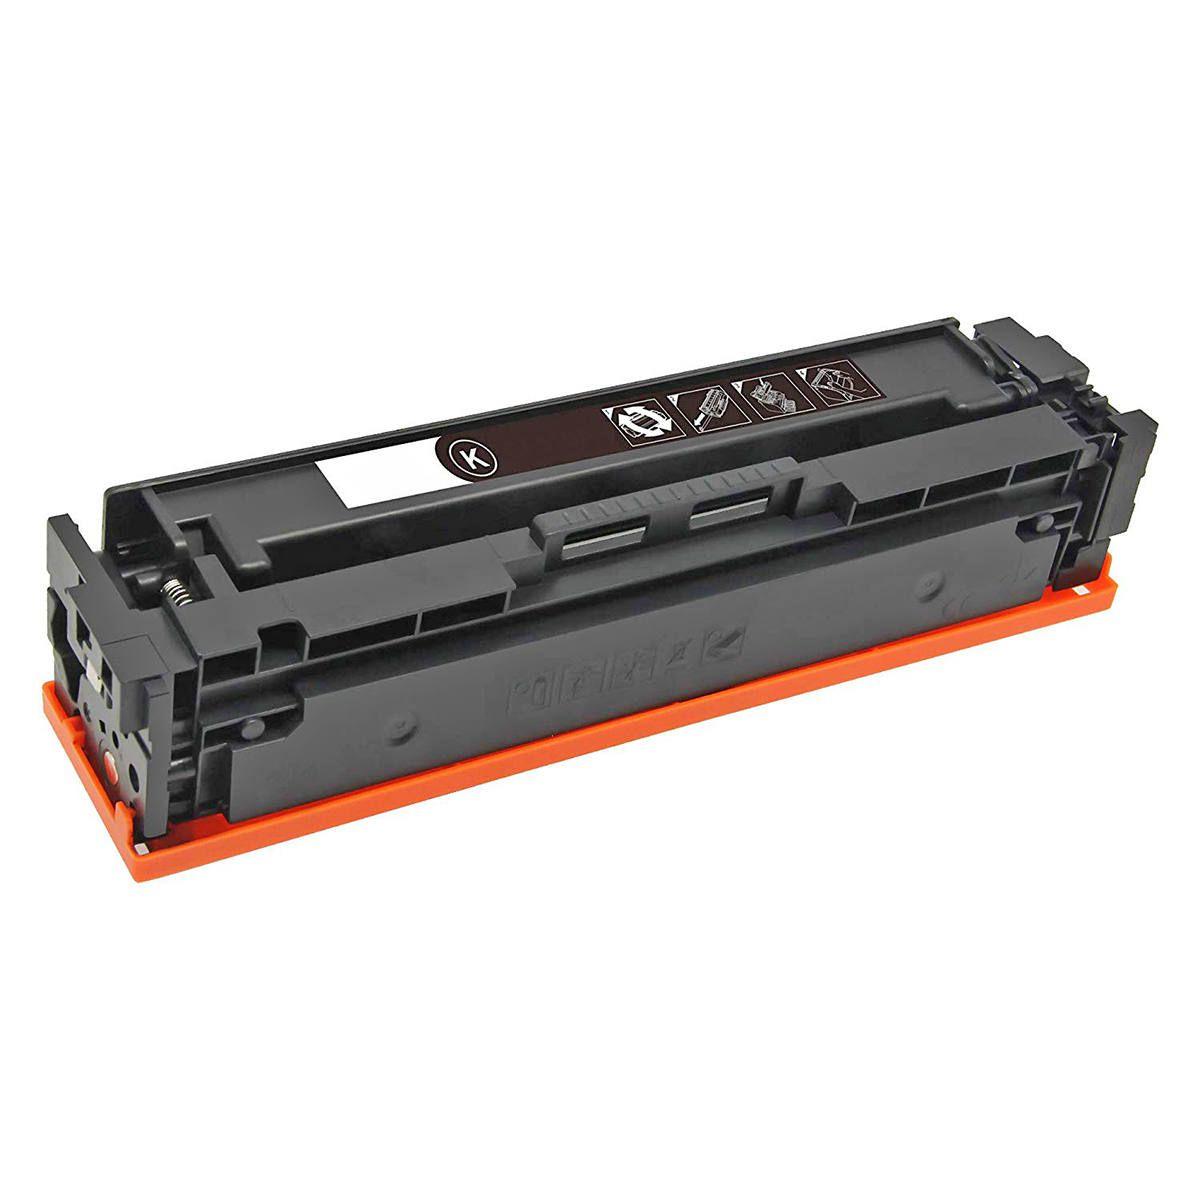 Compatível: Toner CF530A 205A para Impressora HP M154nw M154a M181fw M180nw M180n 154nw 180nw 181fw / Preto / 1.100